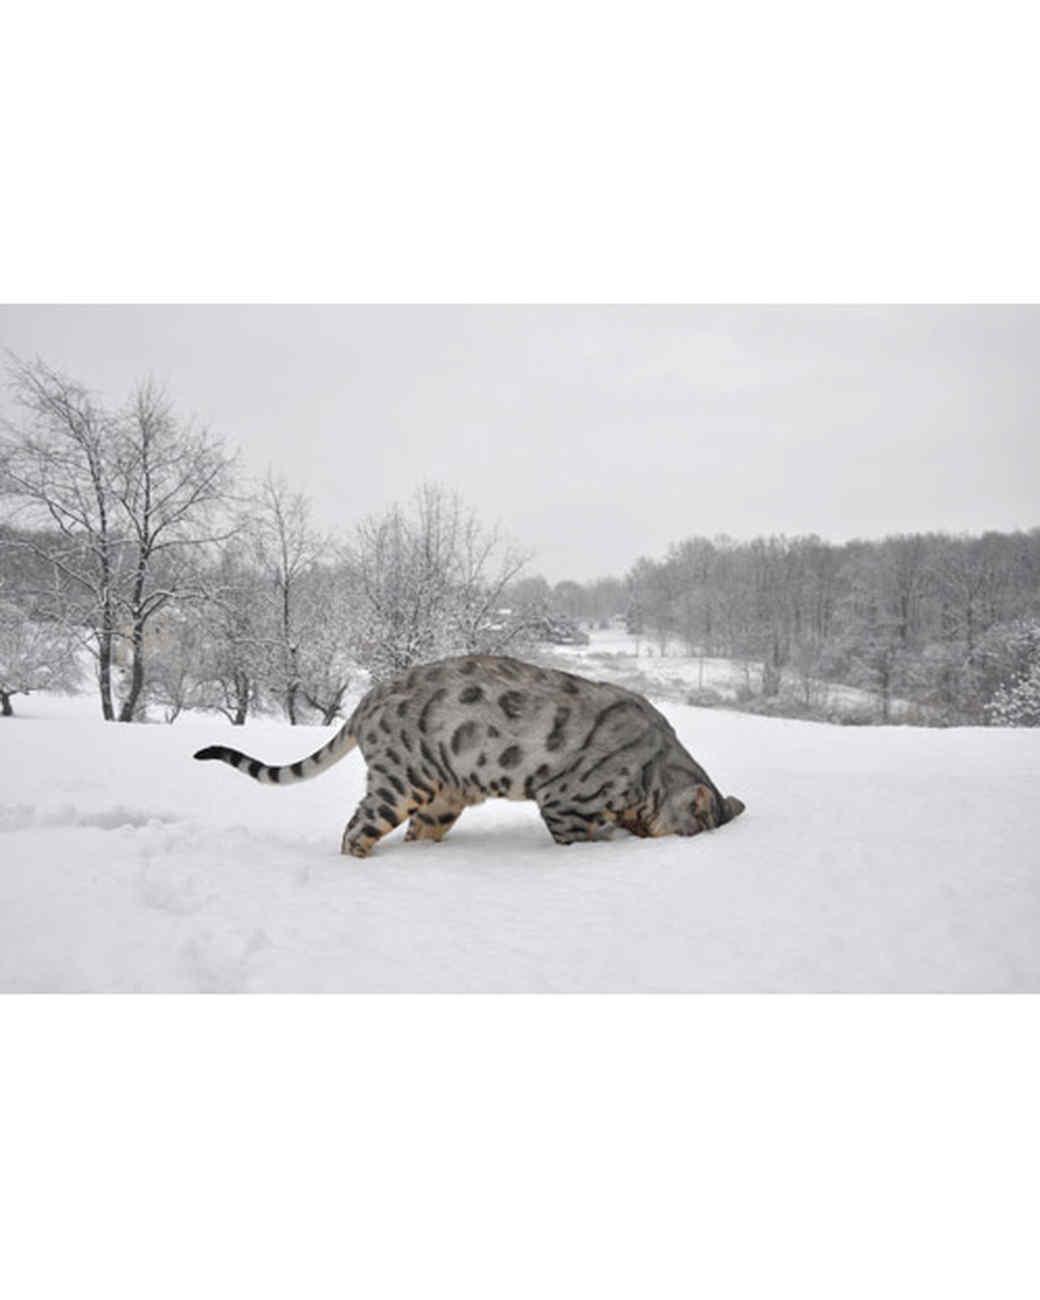 pets_snowangels_7201685_122717_16621526.jpg